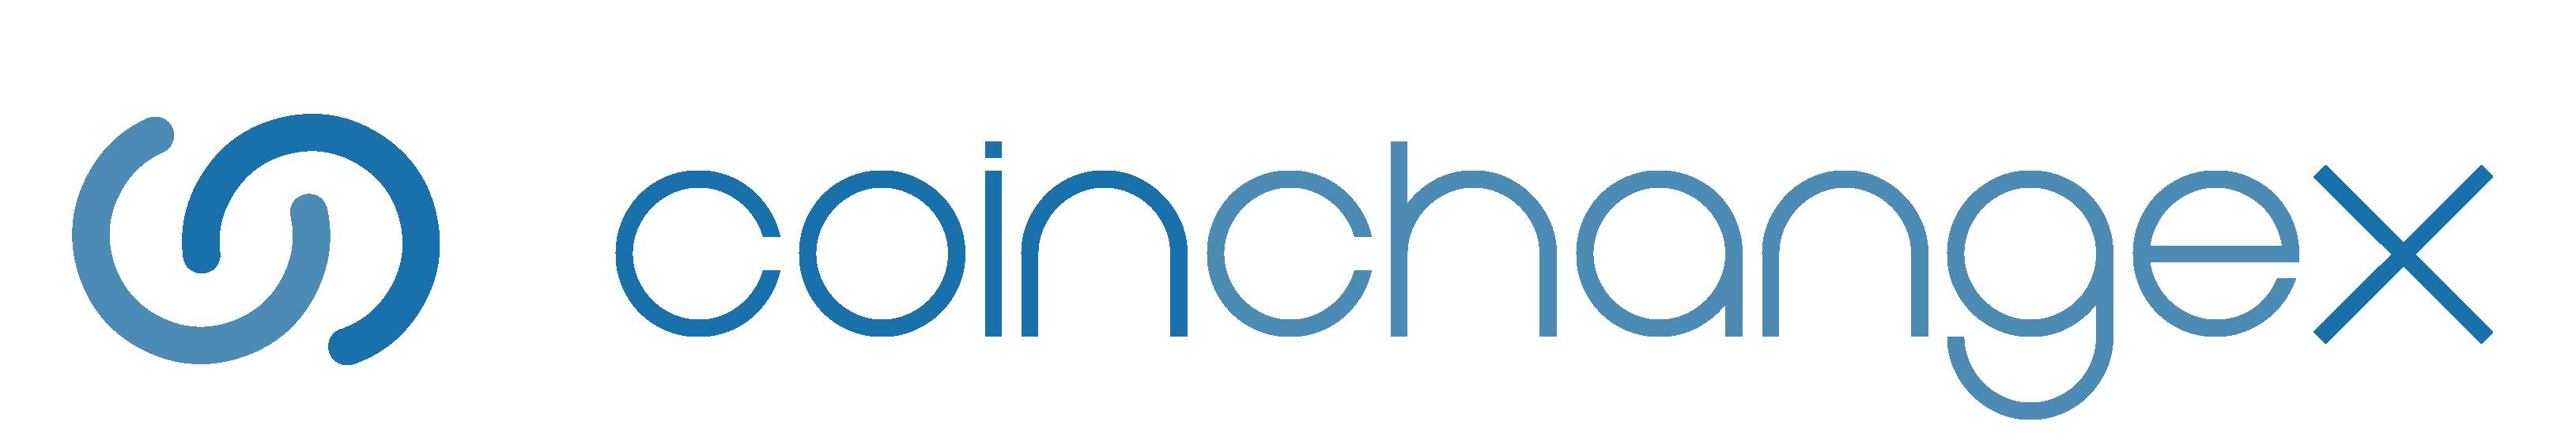 Coinchangex logo